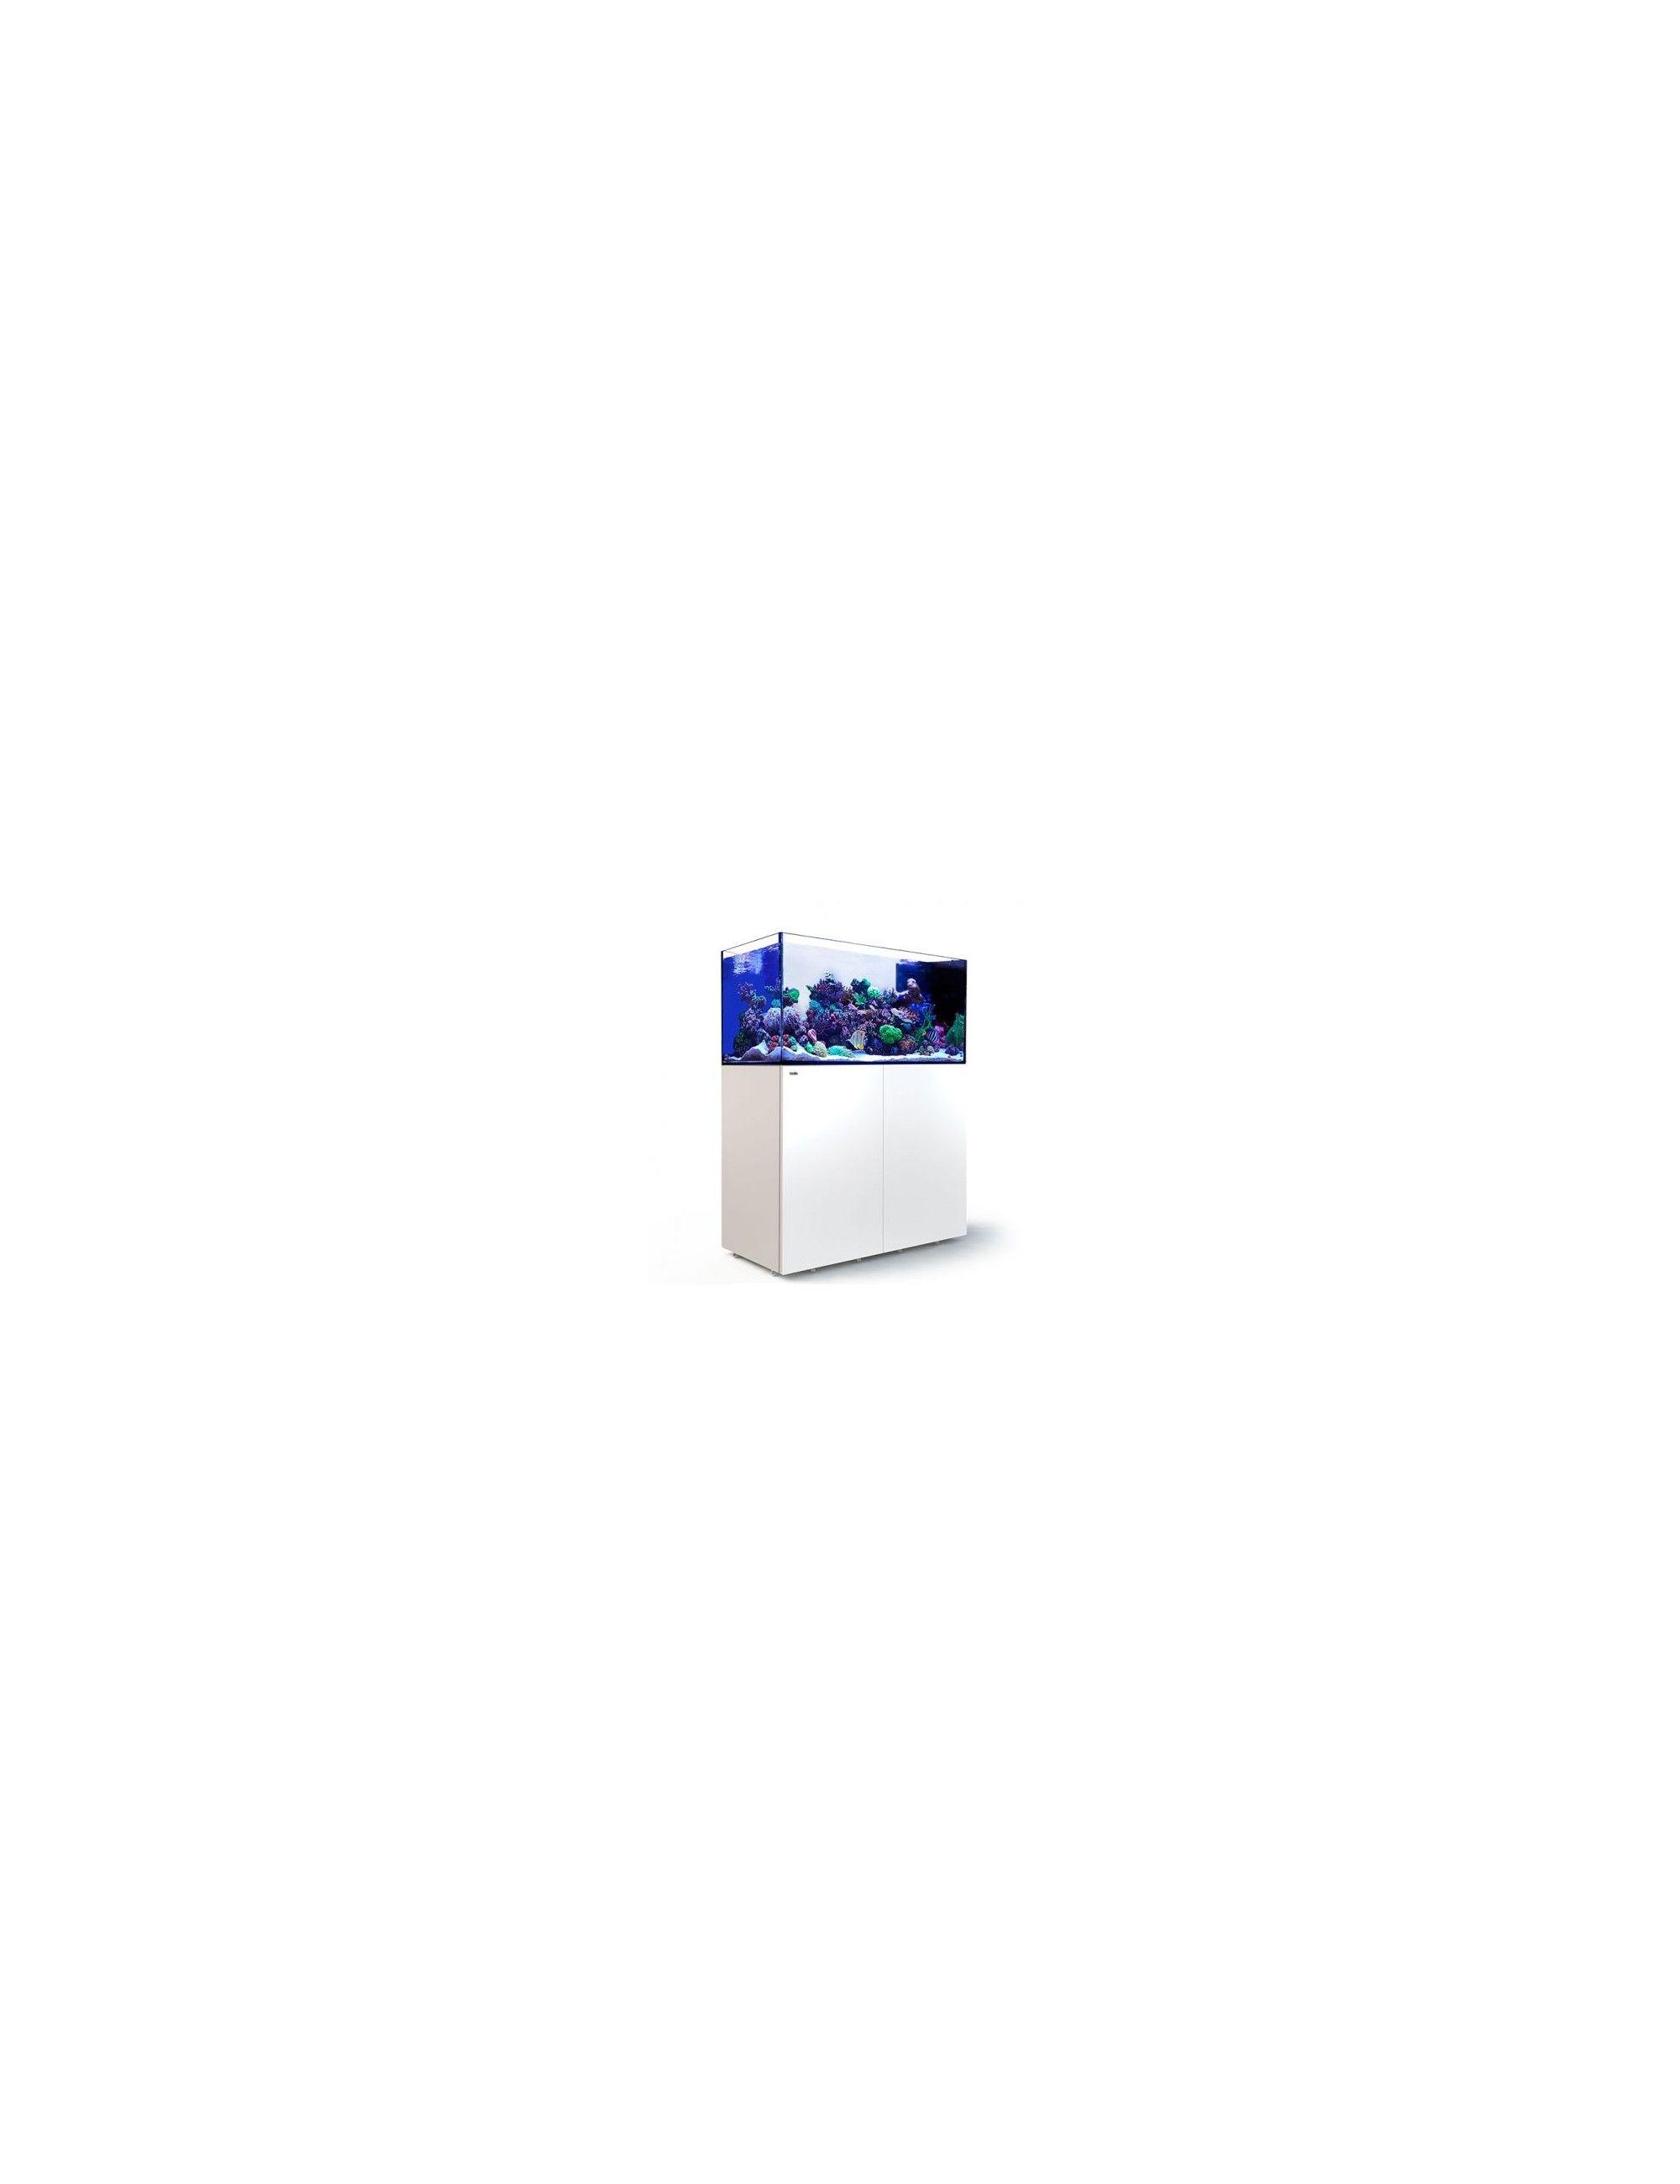 RED SEA - Reefer Peninsula P500 - Meuble Blanc - 500 litres